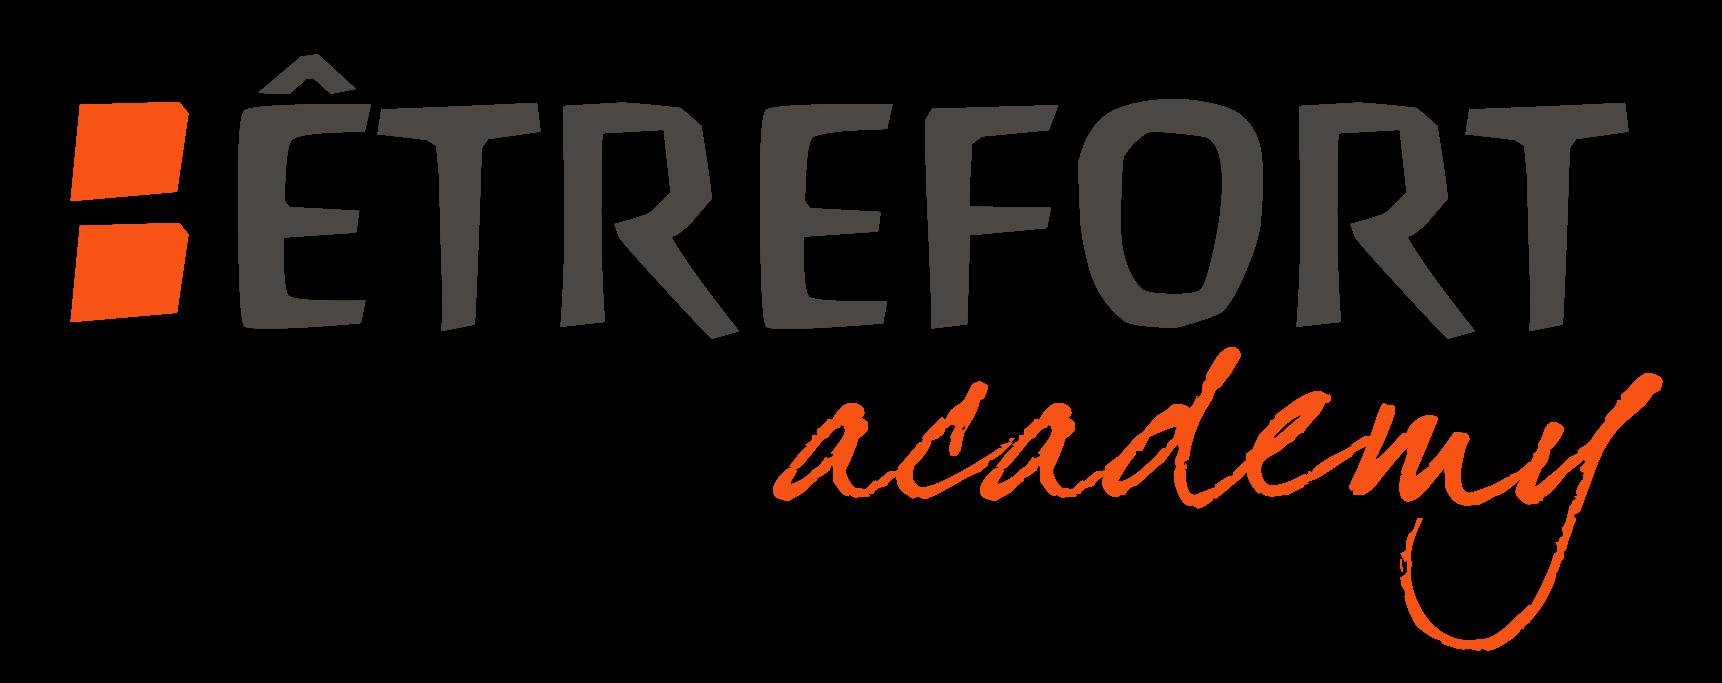 ef1_logo_academy